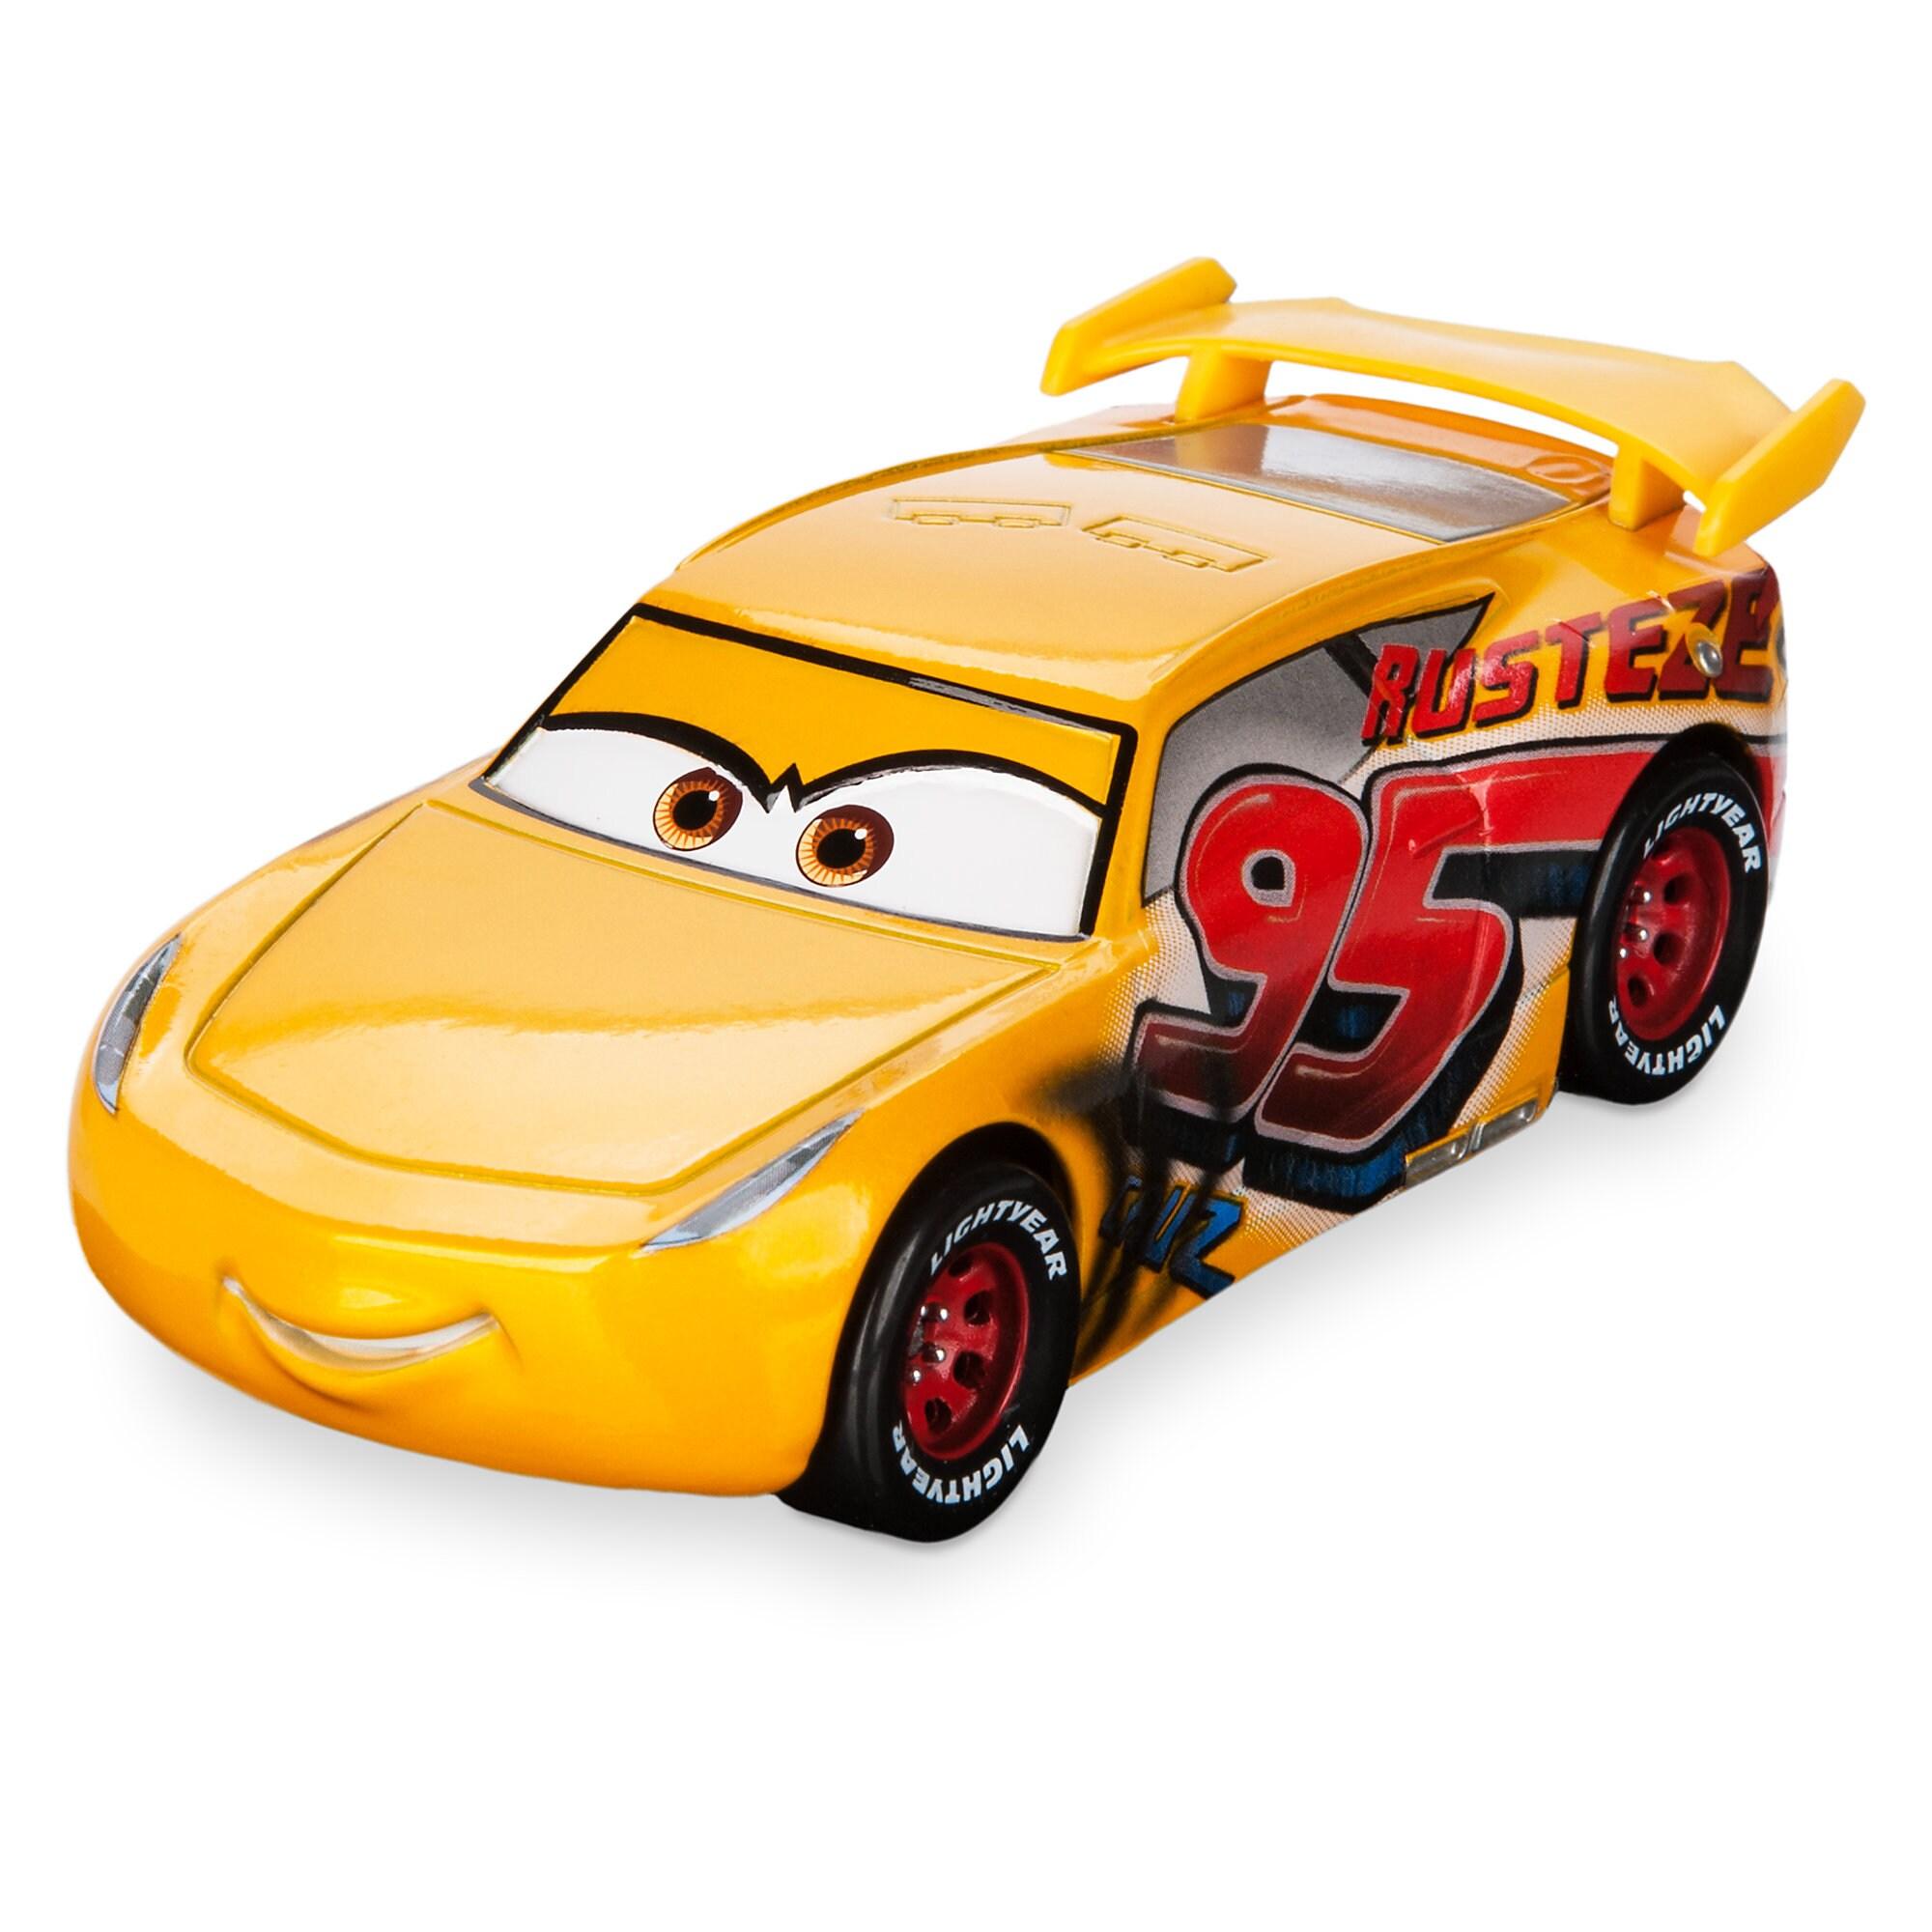 Track Damage Cruz Ramirez Die Cast Car - Chaser Series - Cars 3 - Limited Release